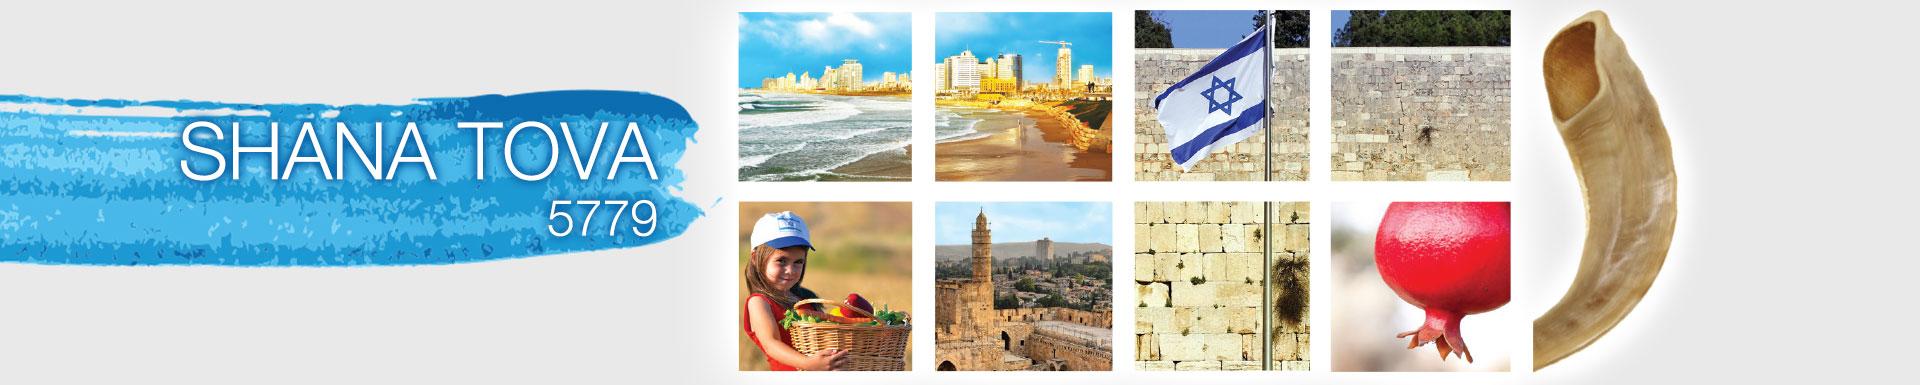 israelbondsdirect Israelbondsintl – Development Company for Israel (International) Ltd.